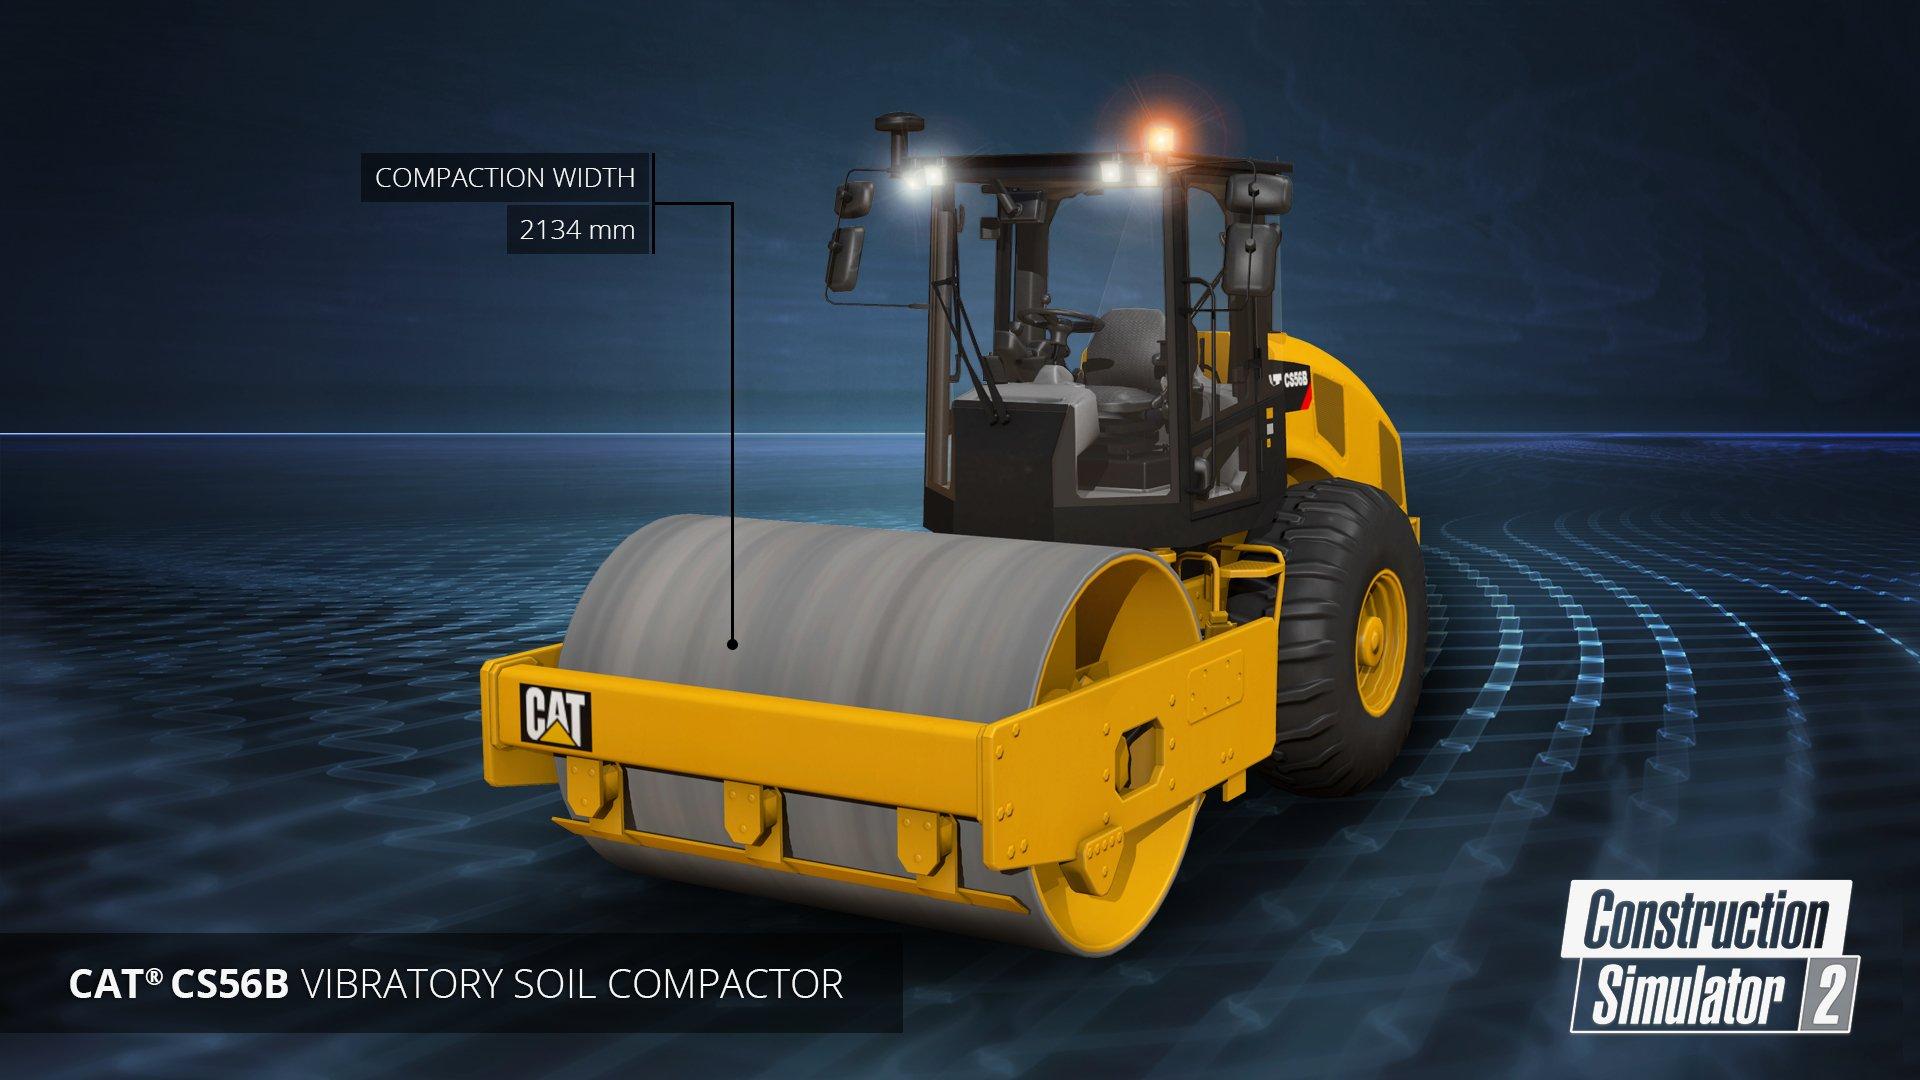 cs2 on twitter the cat cs56b vibratory soil compactor. Black Bedroom Furniture Sets. Home Design Ideas